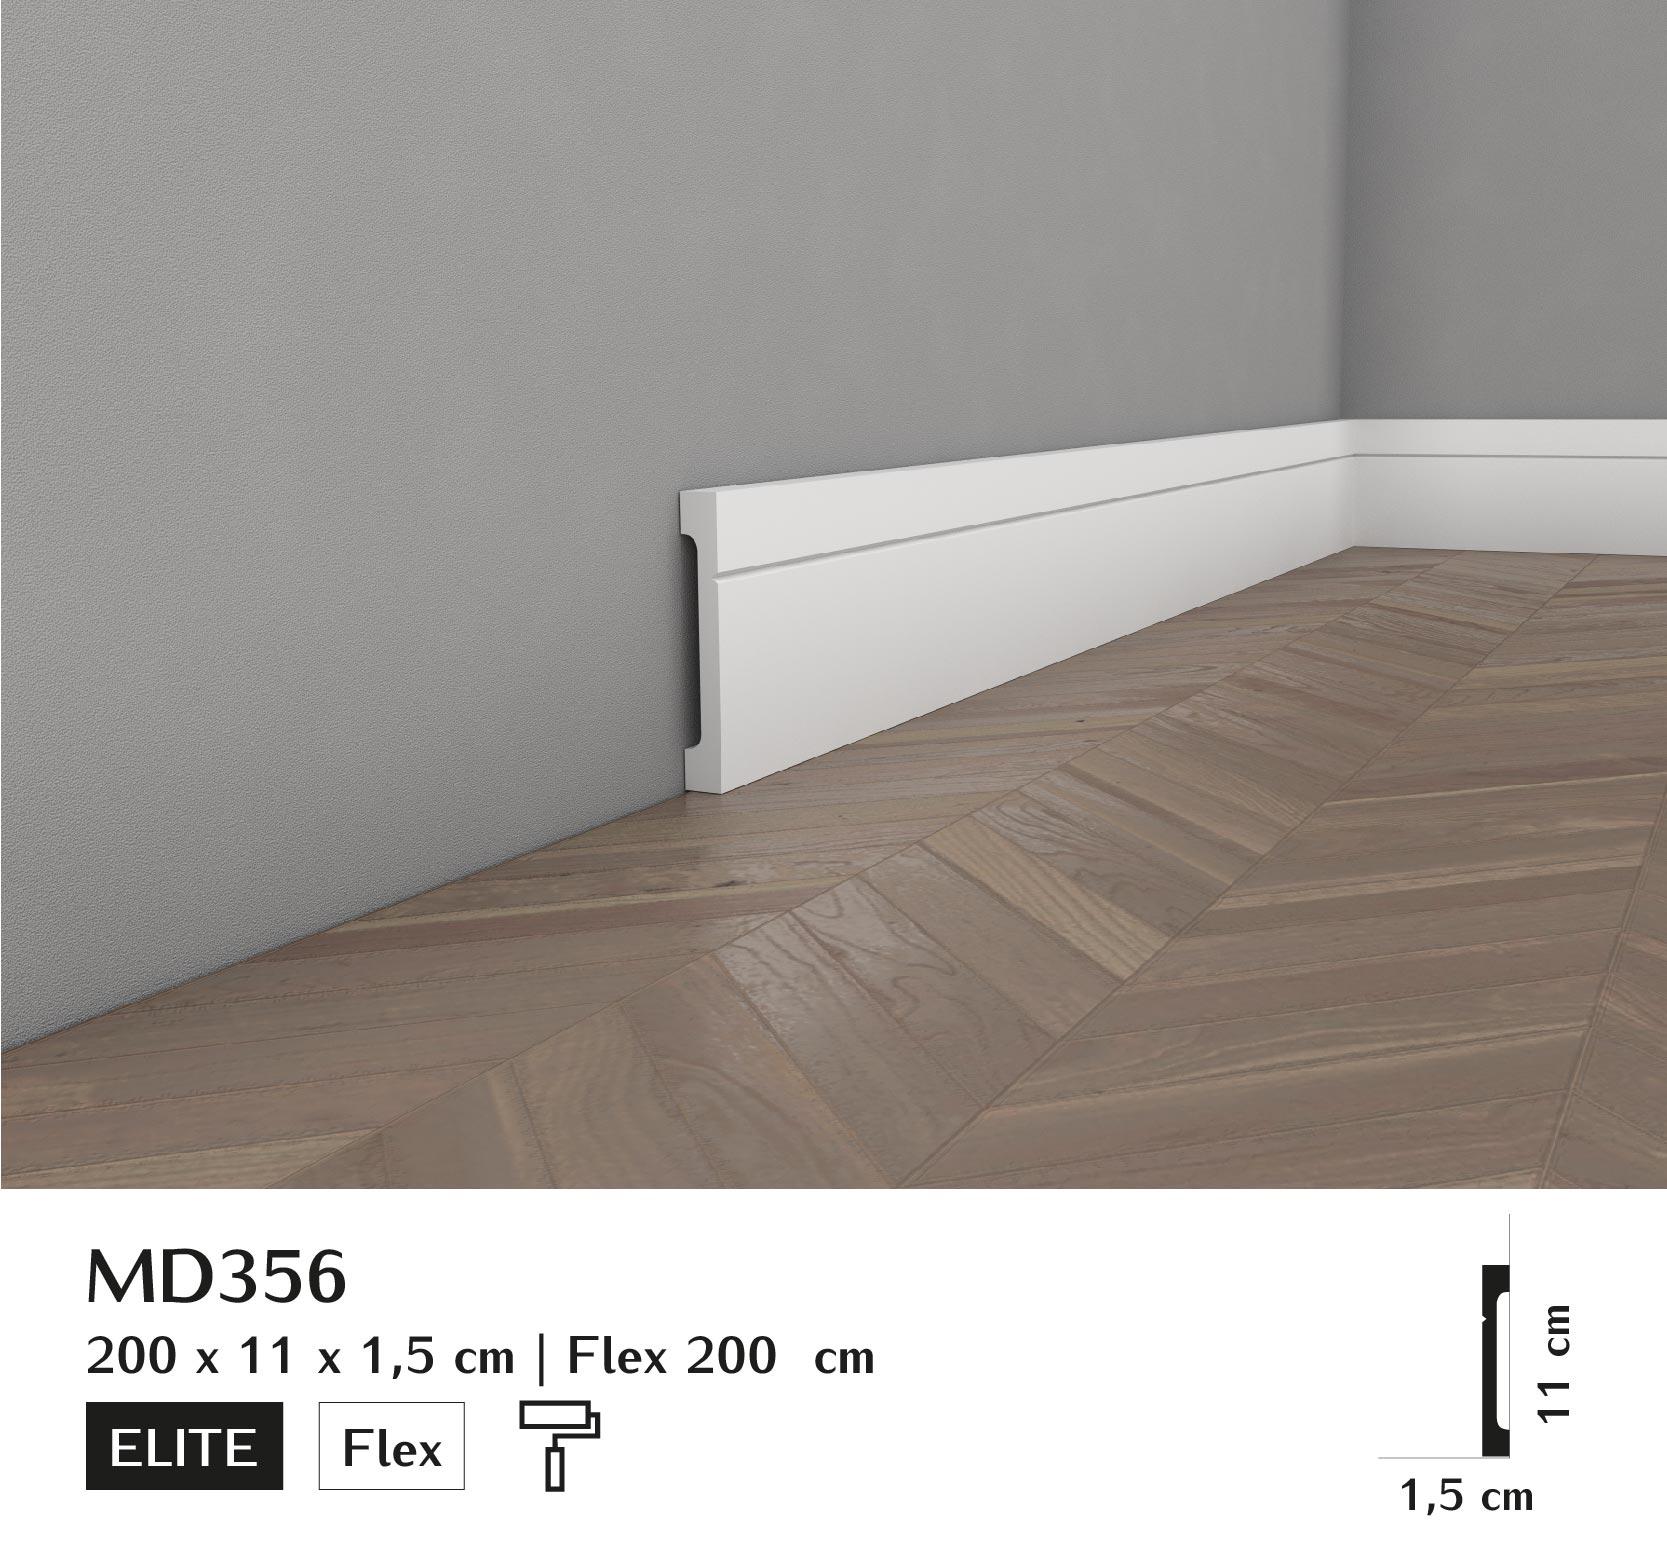 Md356